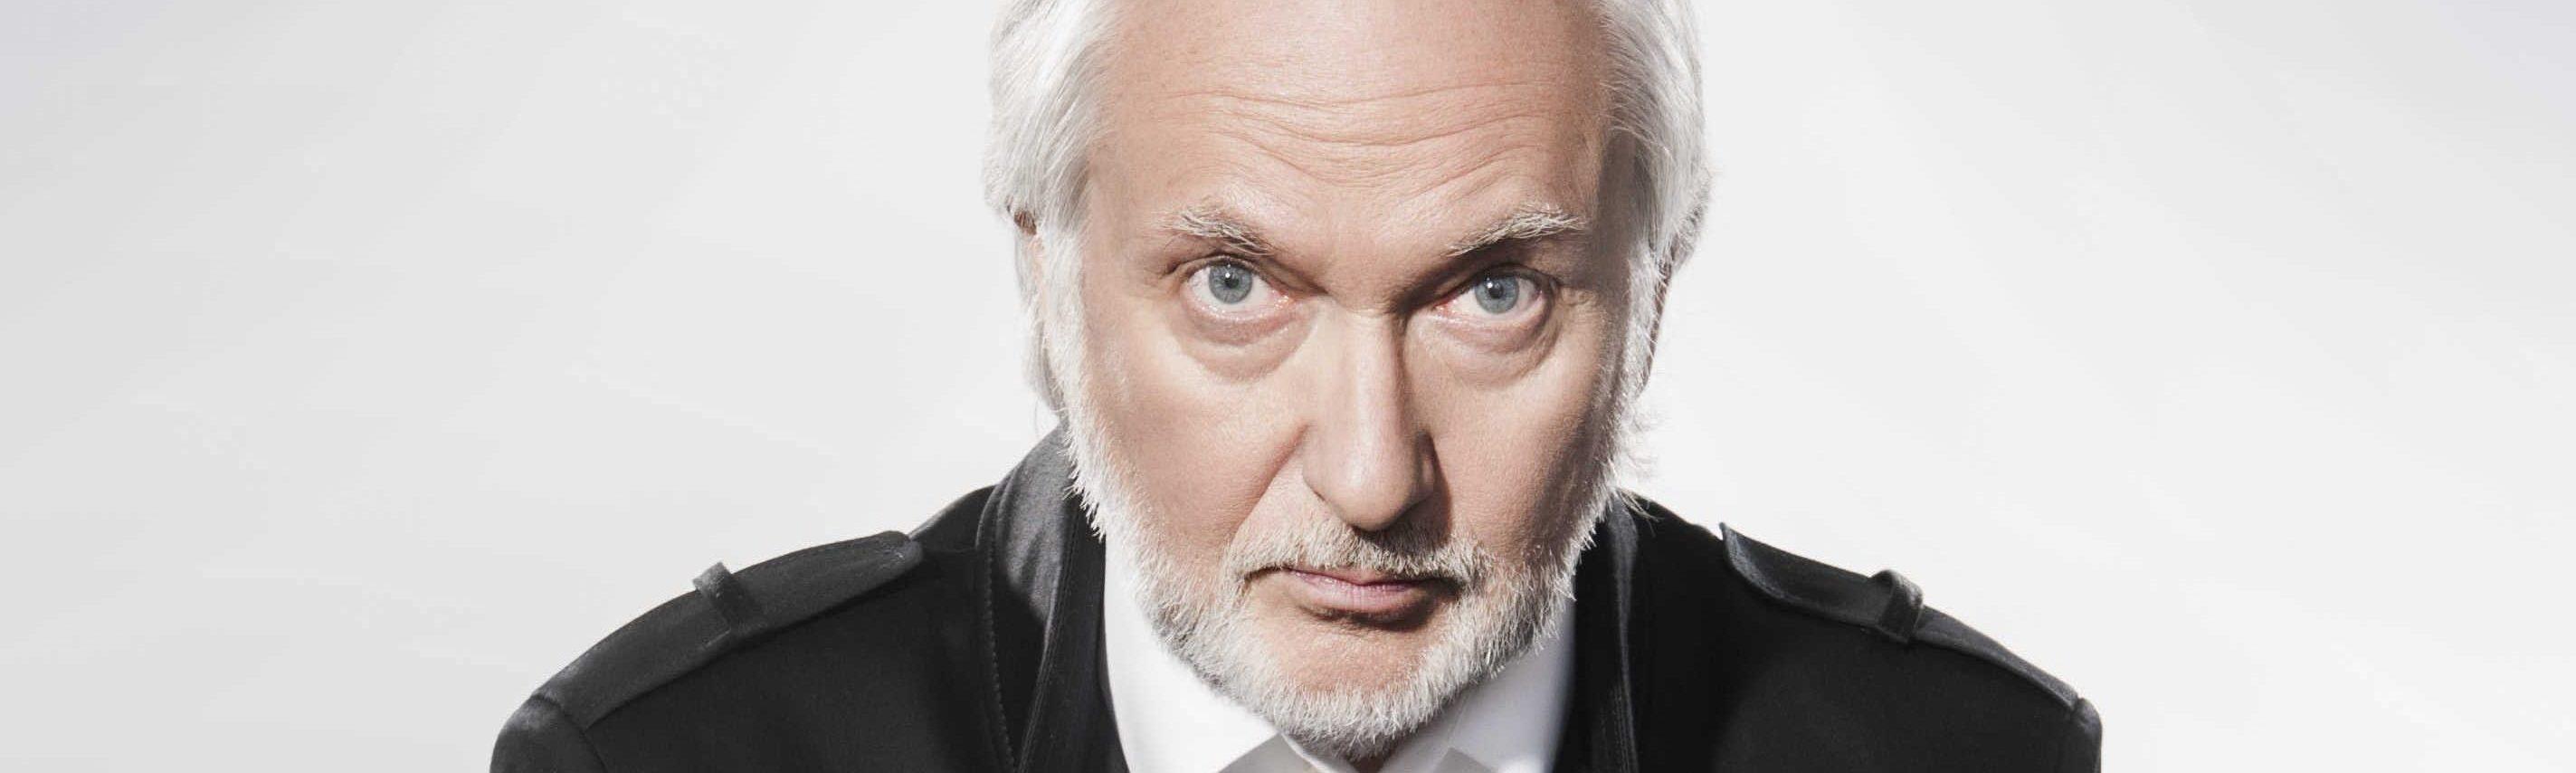 Joachim Witt Promi Big Brother 2016 Kandidat Sat1